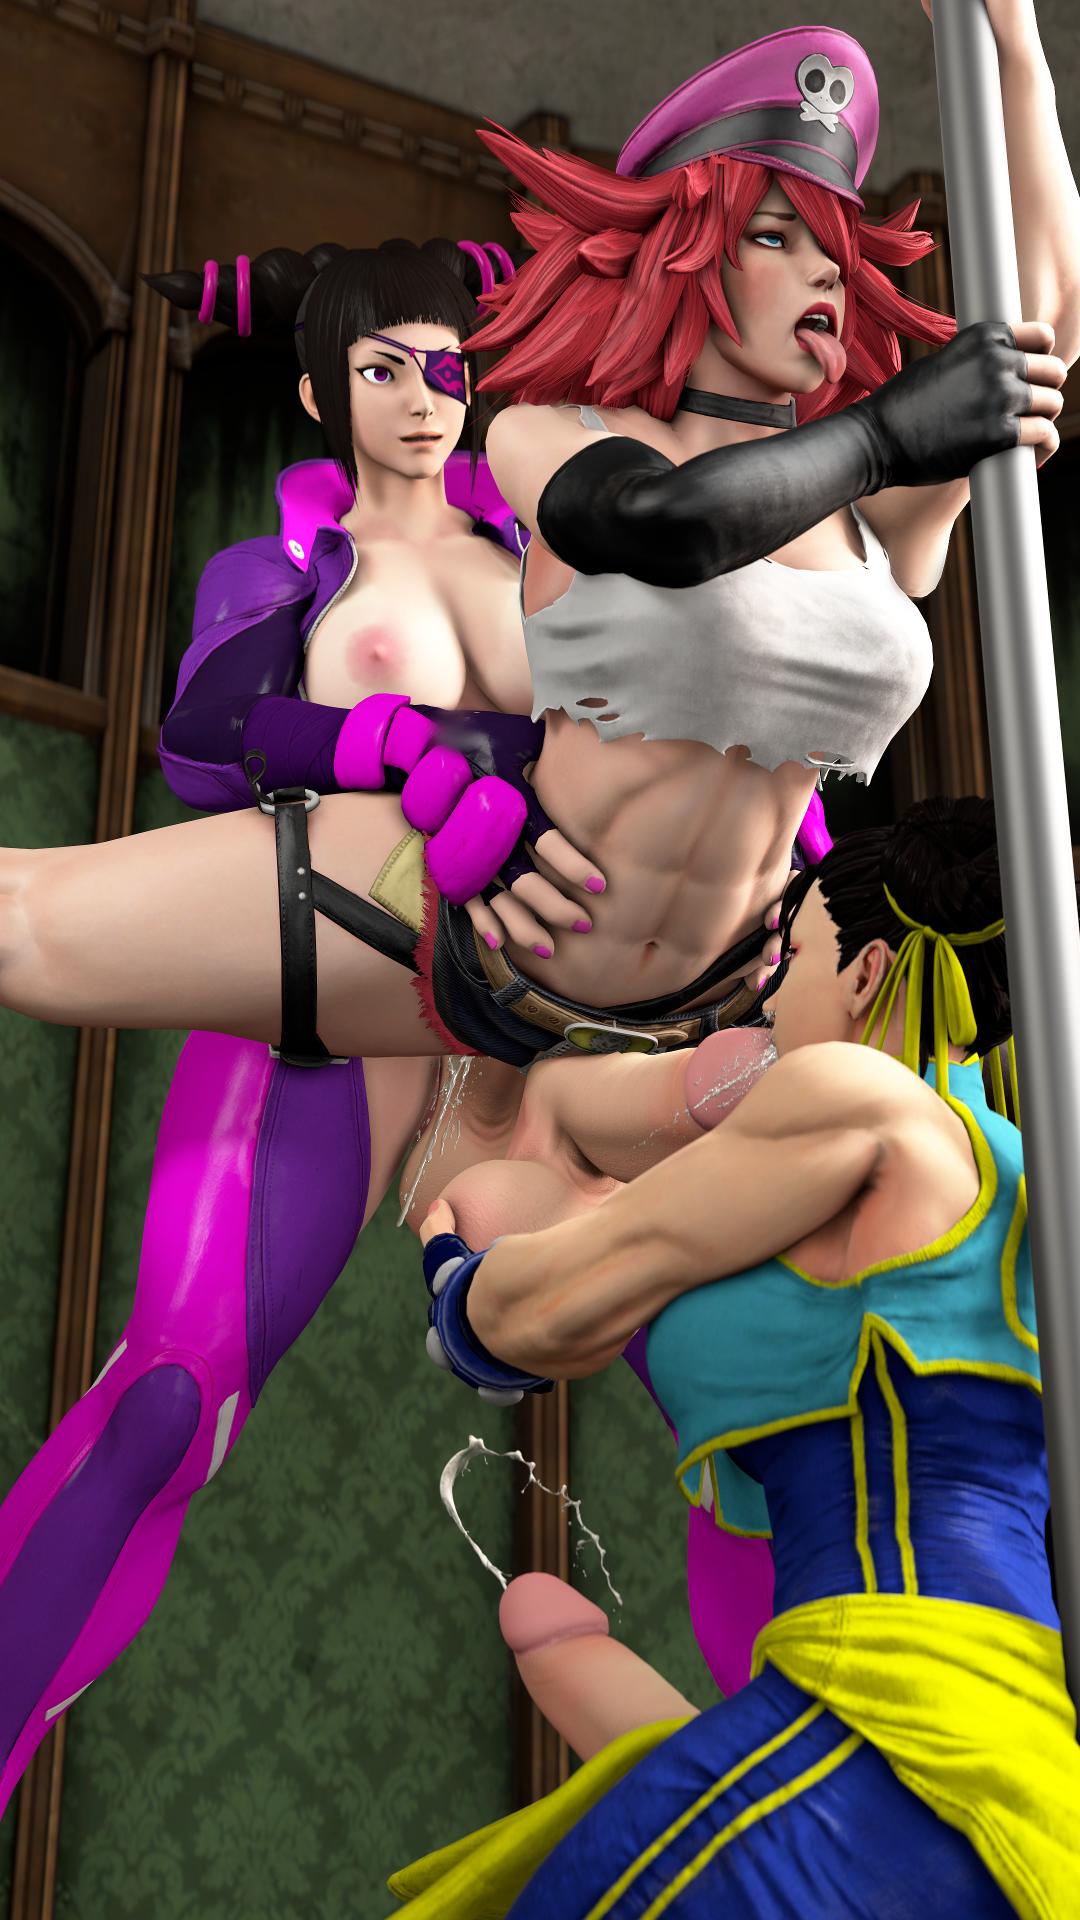 Poison double team'd [futa]